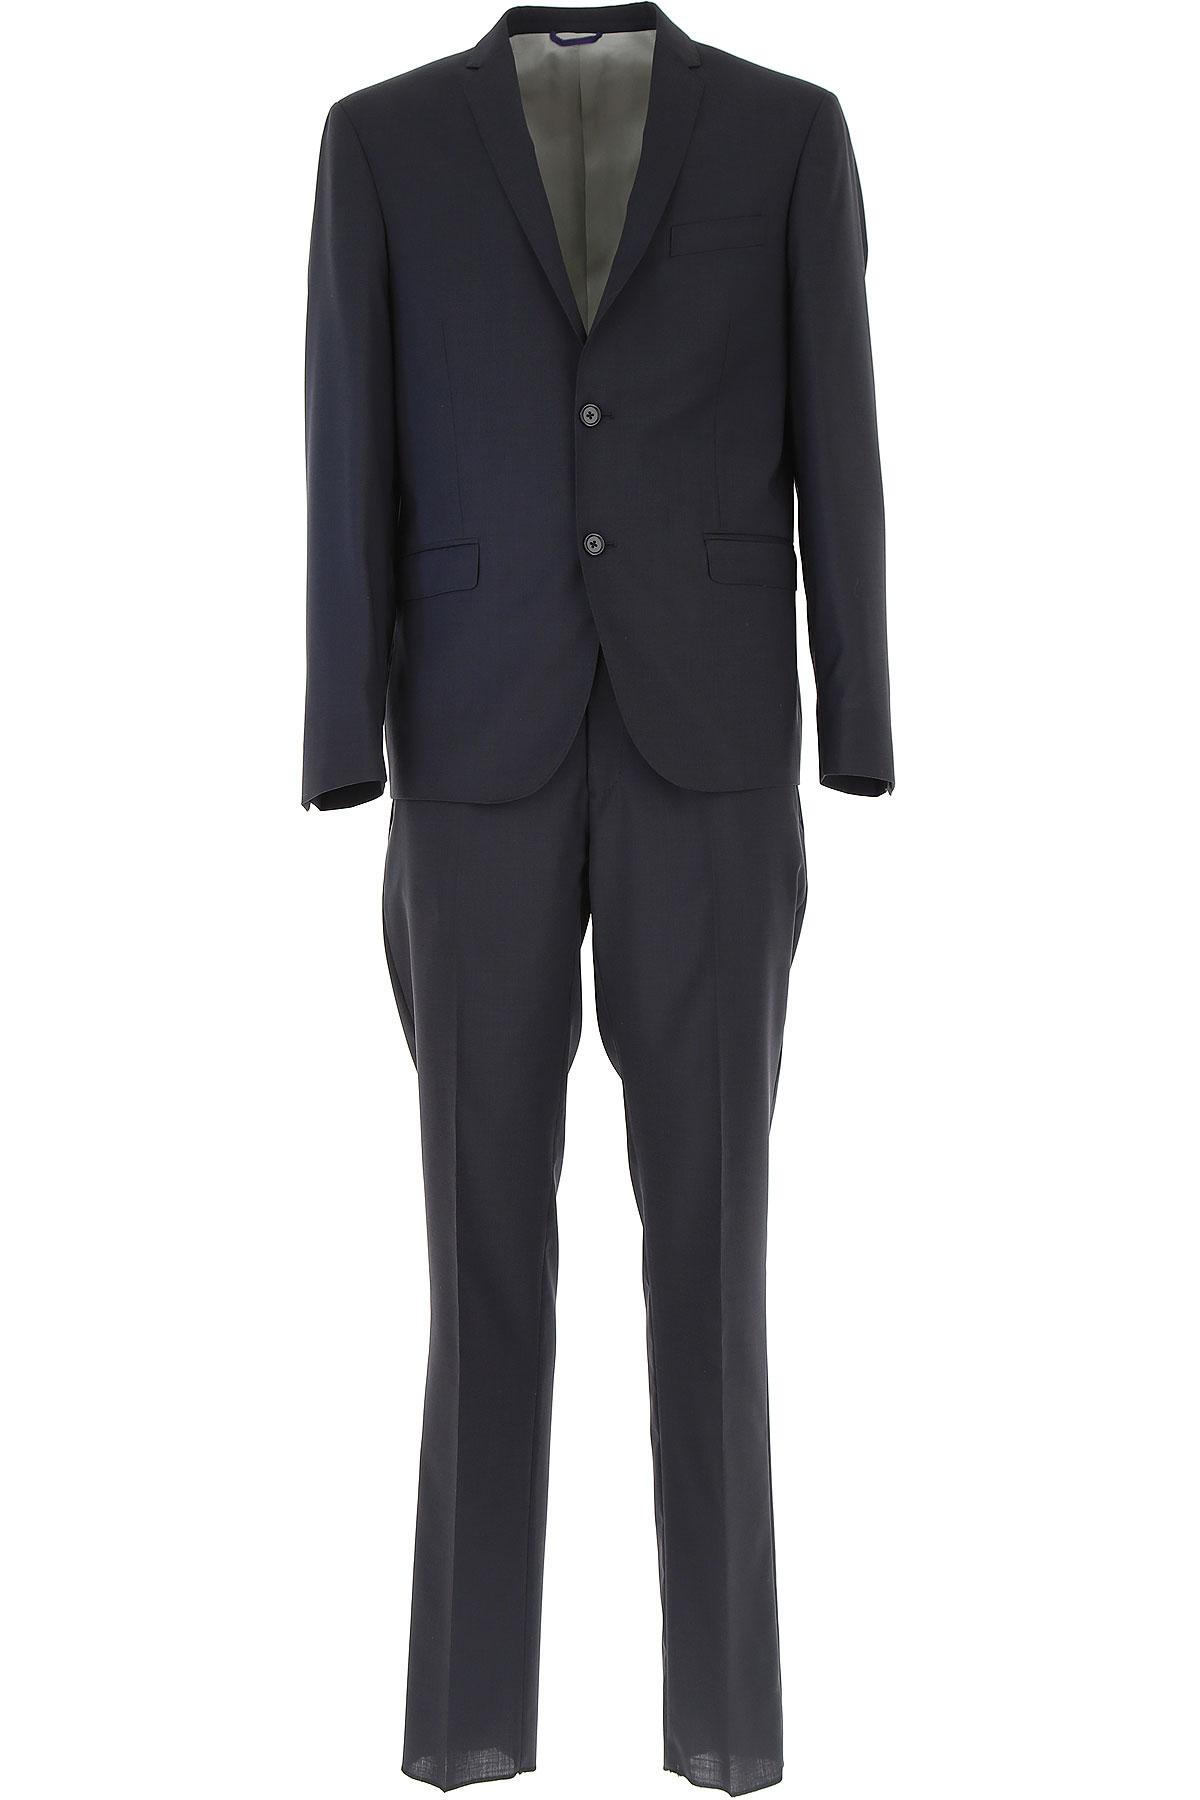 Simbols Men's Suit, Midnight Blue, Wool, 2019, XXL XXXL